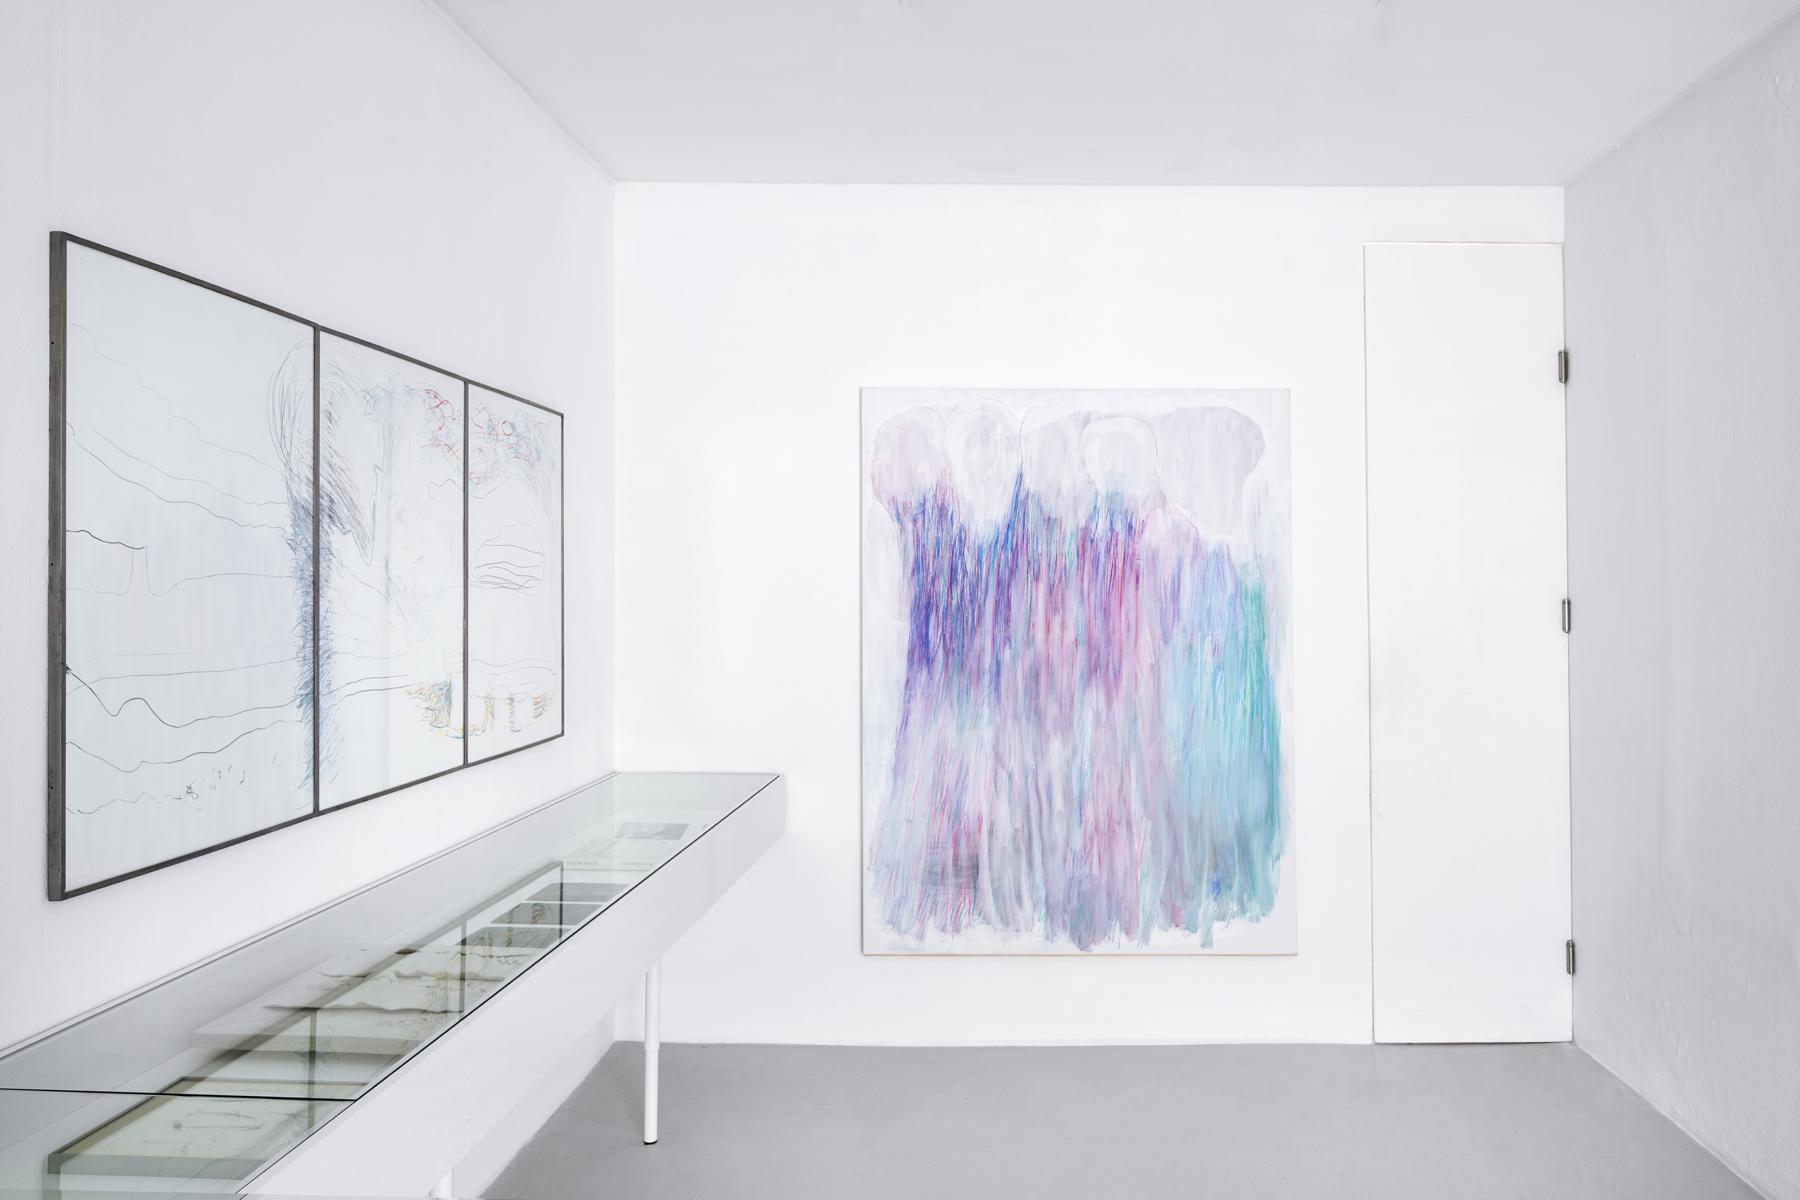 K1600_Mosny_Gonn_2017_Ausstellungsansicht_Verena_Nagl_12